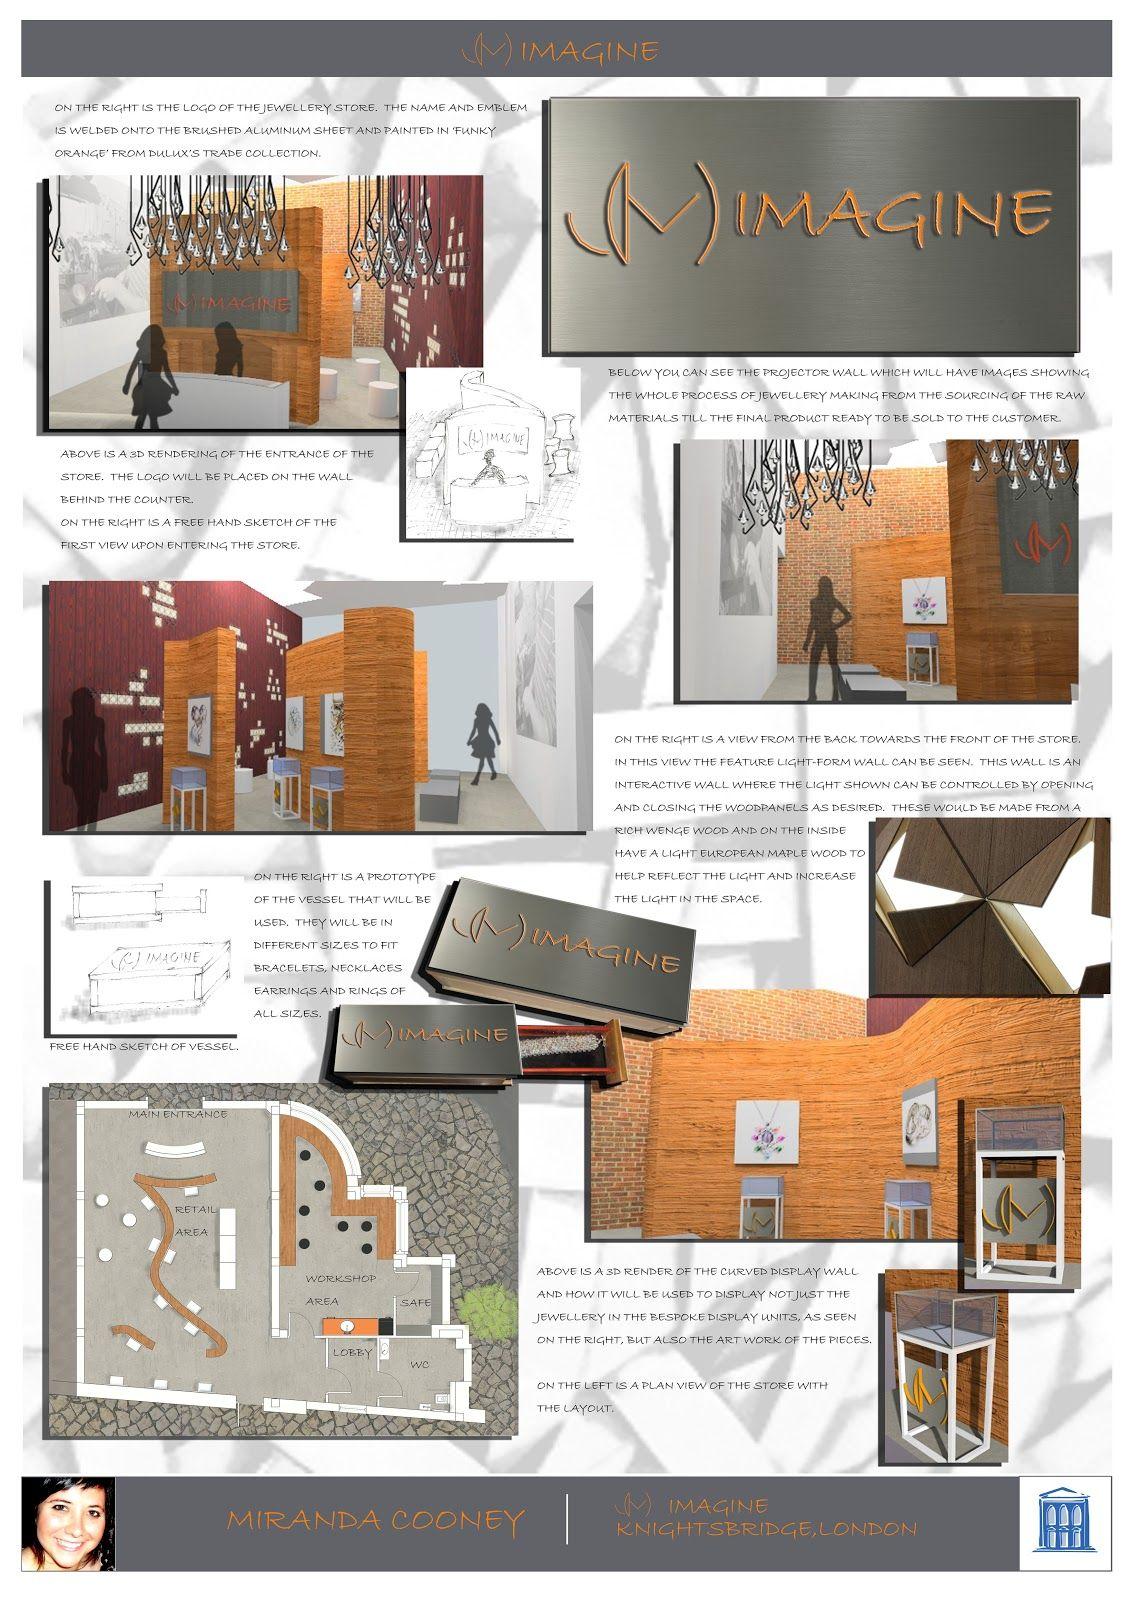 Presentationboarda3 Jpg 1131 1600 With Images Interior